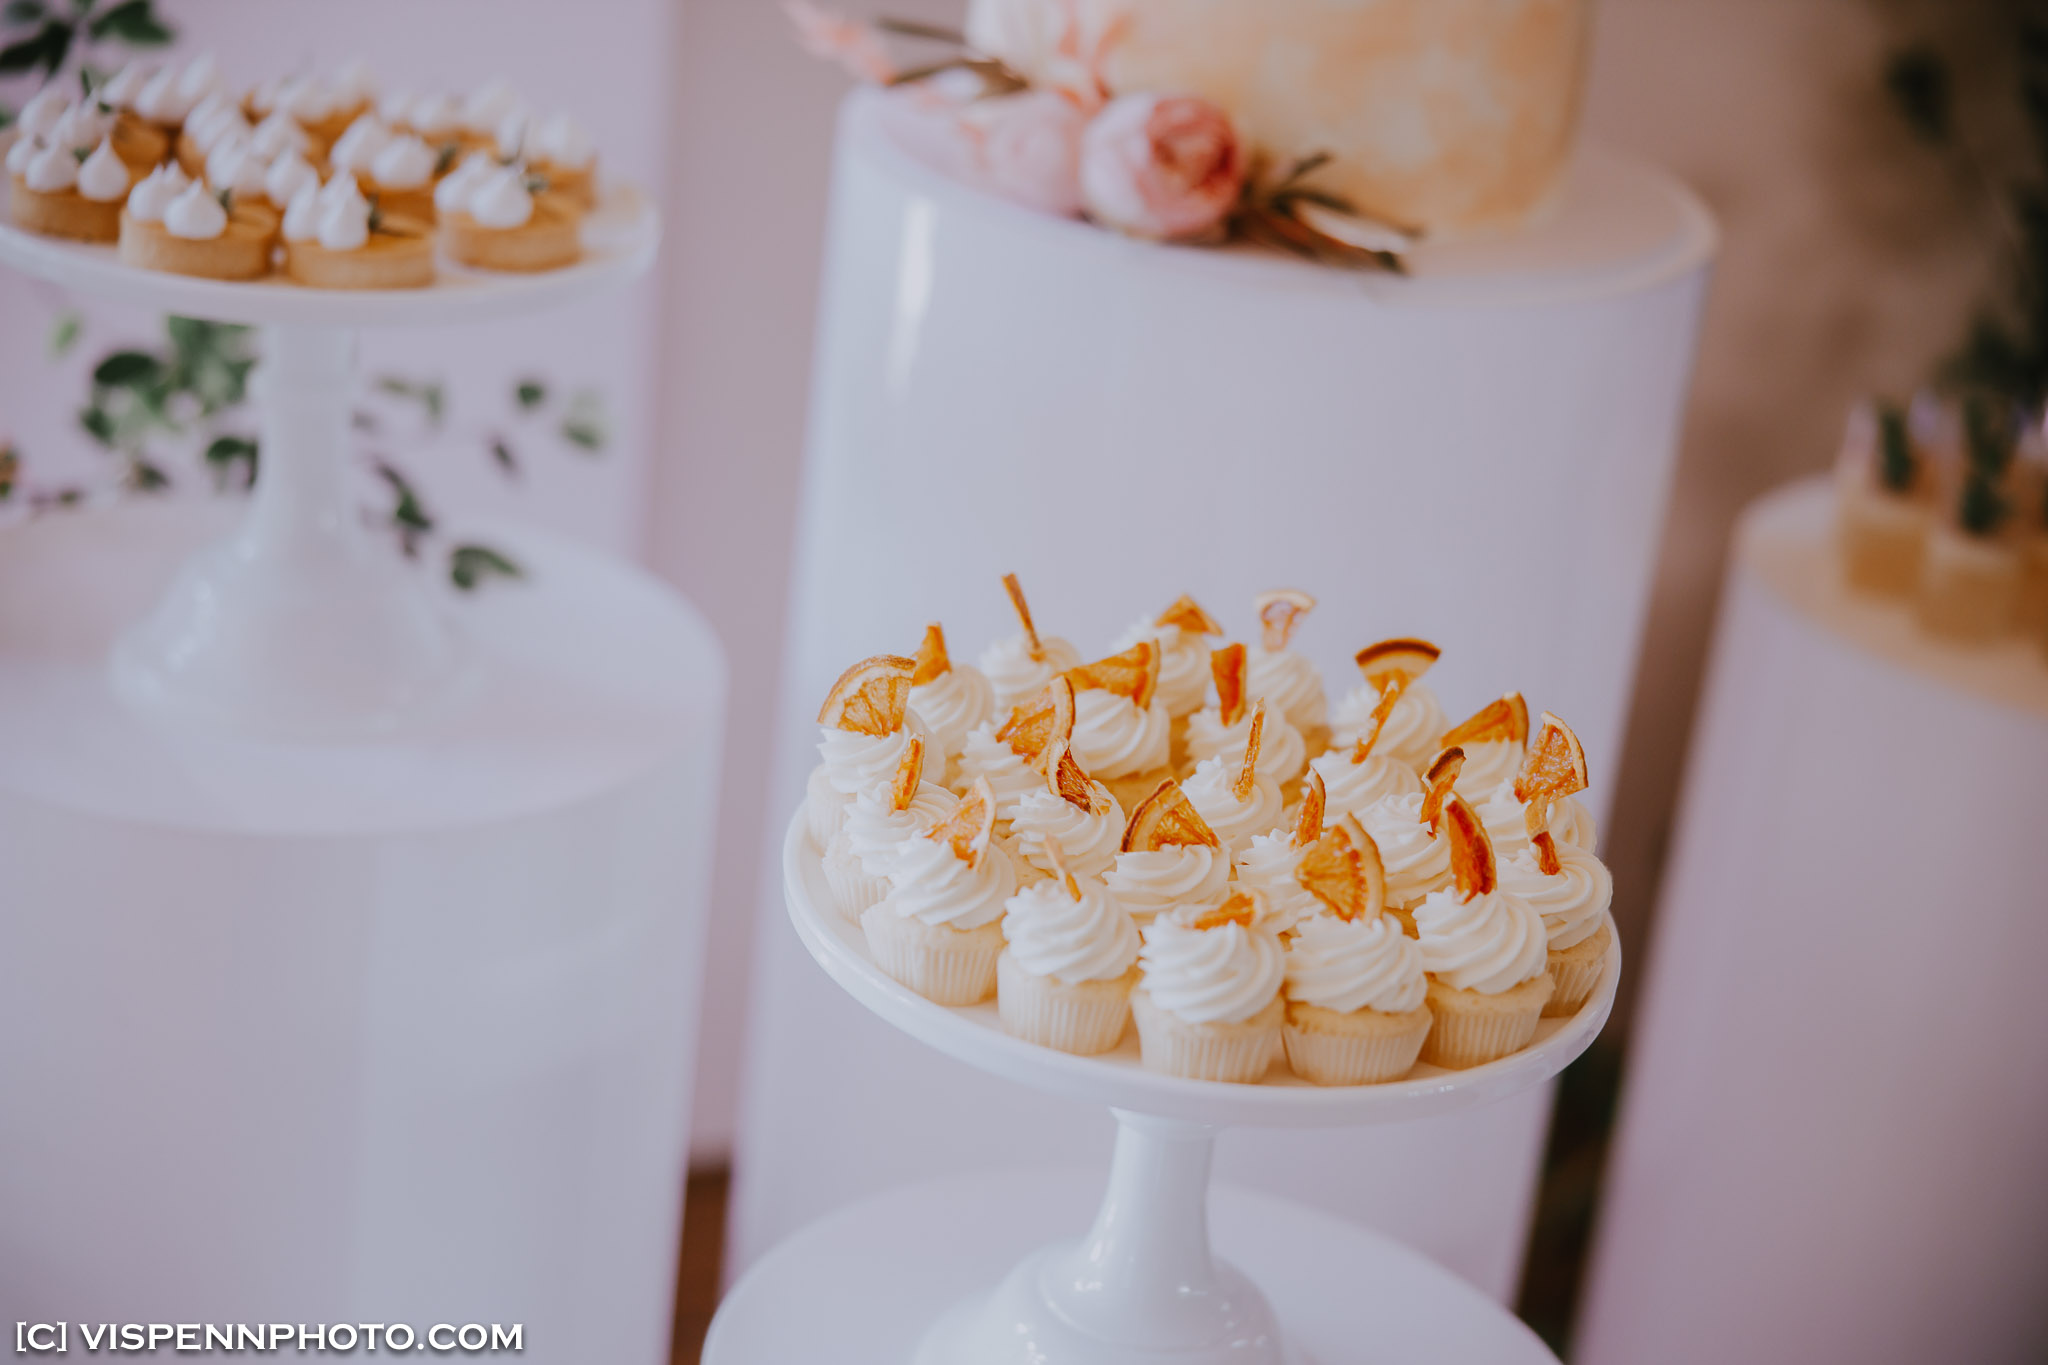 WEDDING DAY Photography Melbourne ElitaPB 07052 1P EOSR ZHPENN